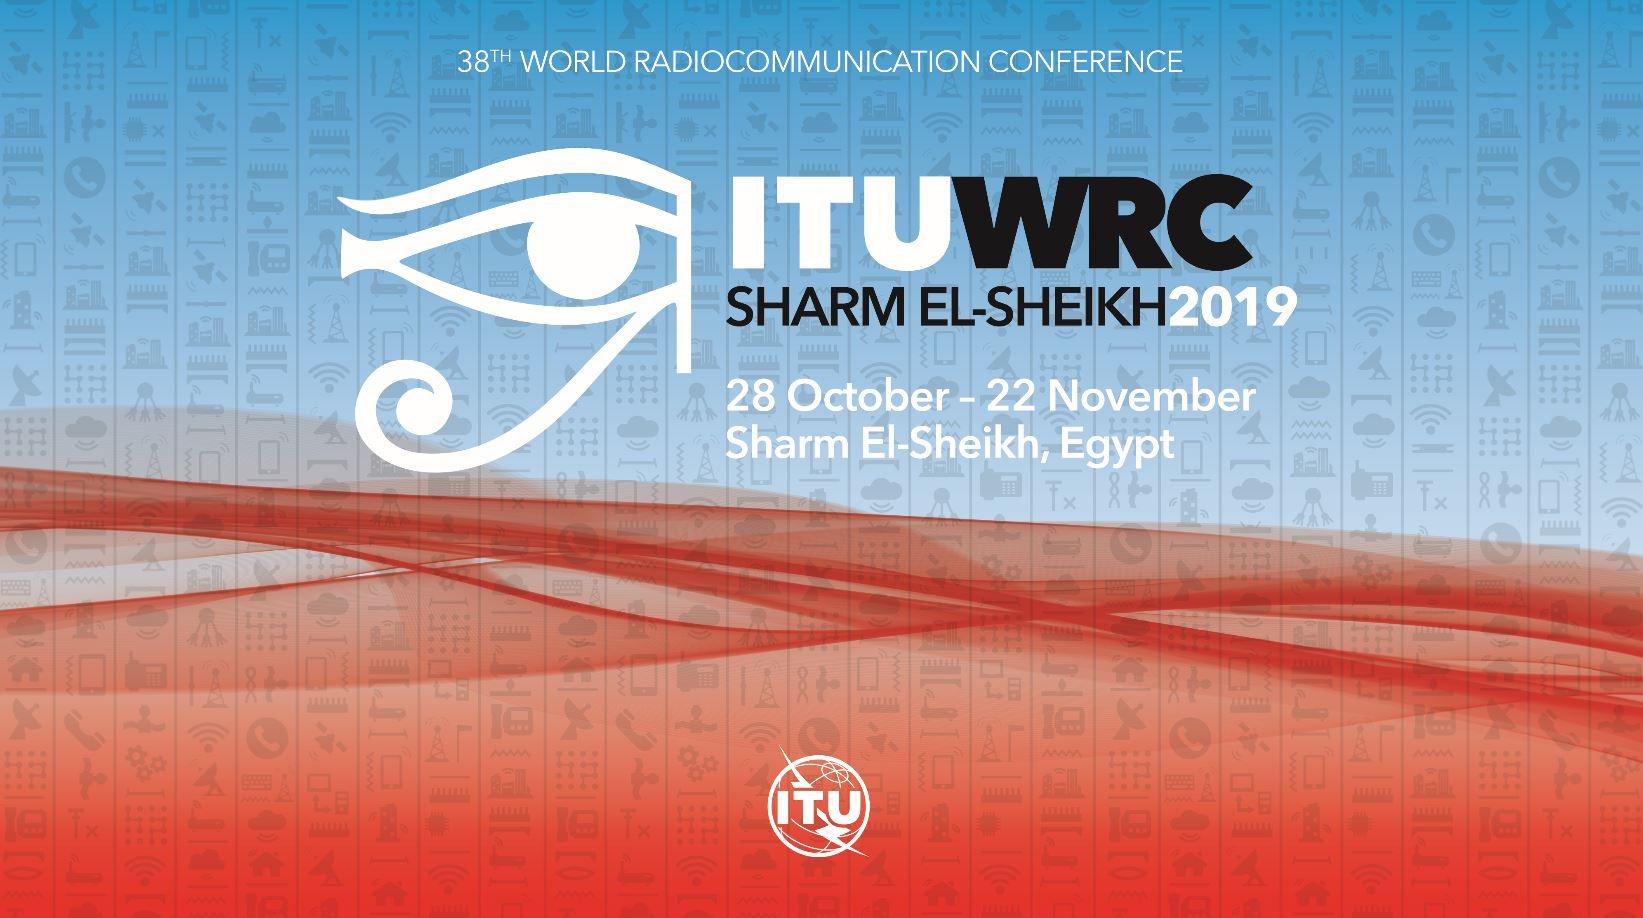 Counterpoint ITU WRC 2019